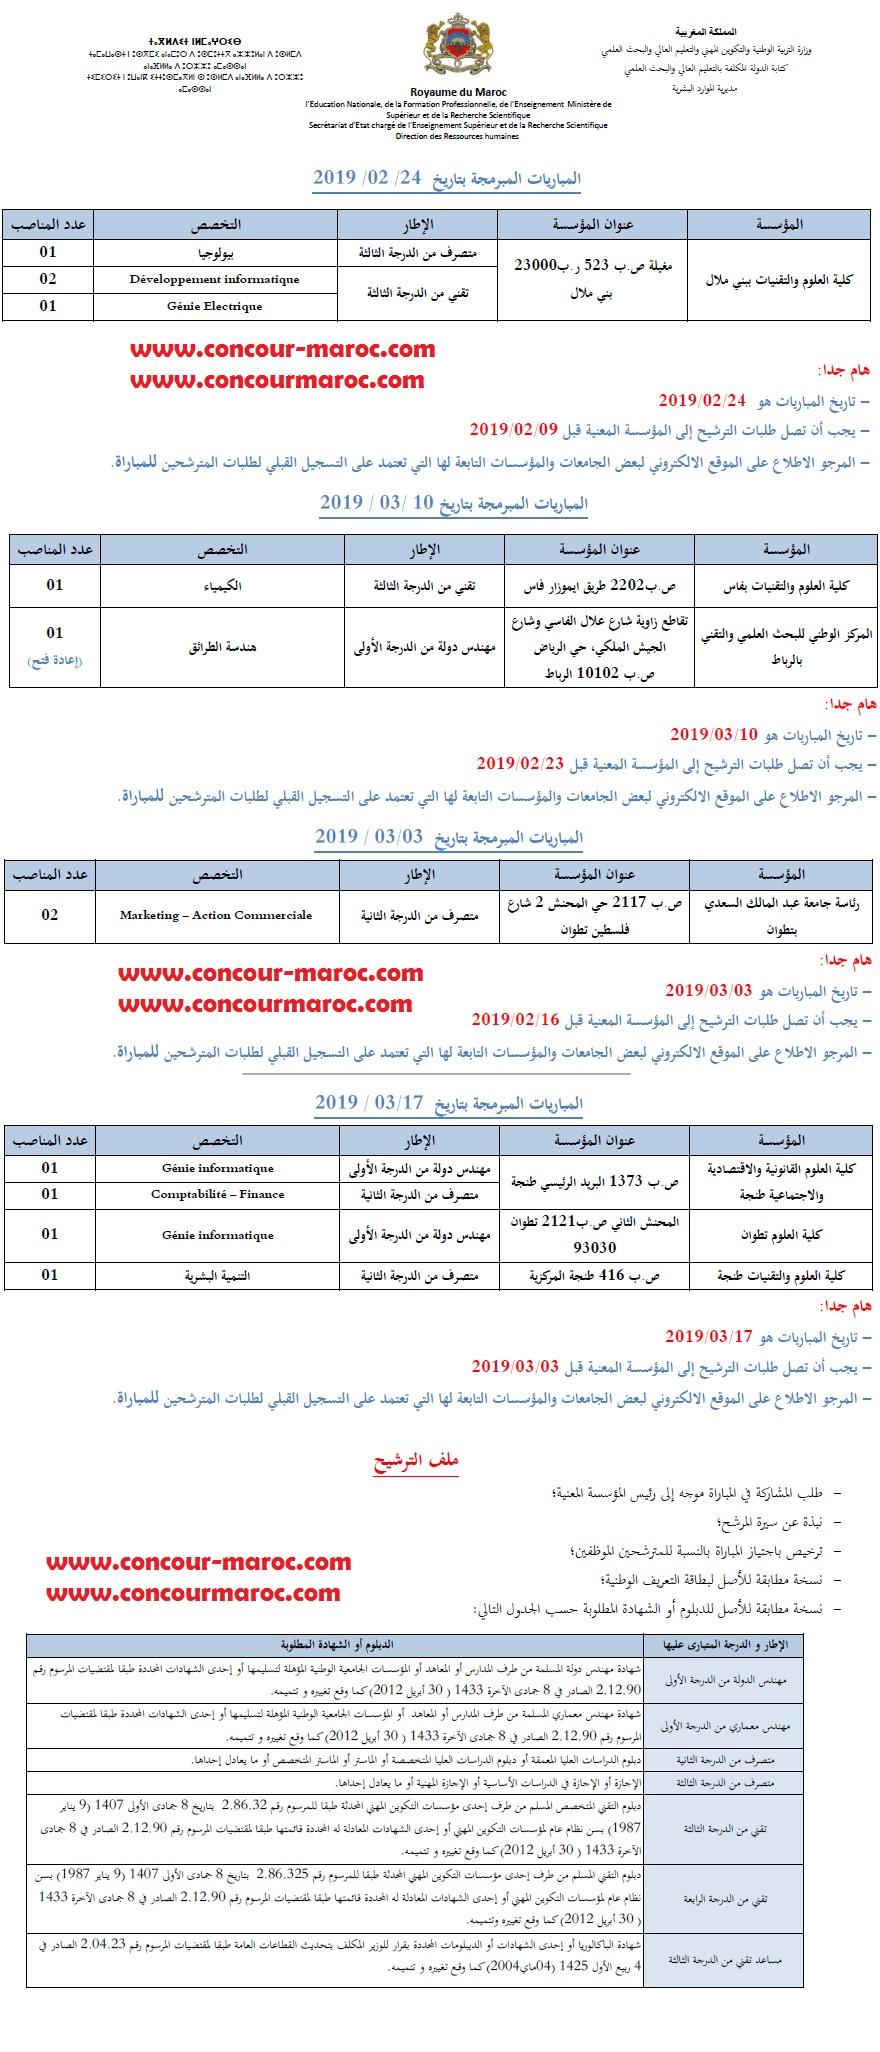 مؤسسات جامعية : مباريات لتوظيف 12 منصب تقني متخصص و متصرف و مهندس اخر اجل 09 و 16 و 23 فبراير و 03 مارس 2019 Aaooo_10